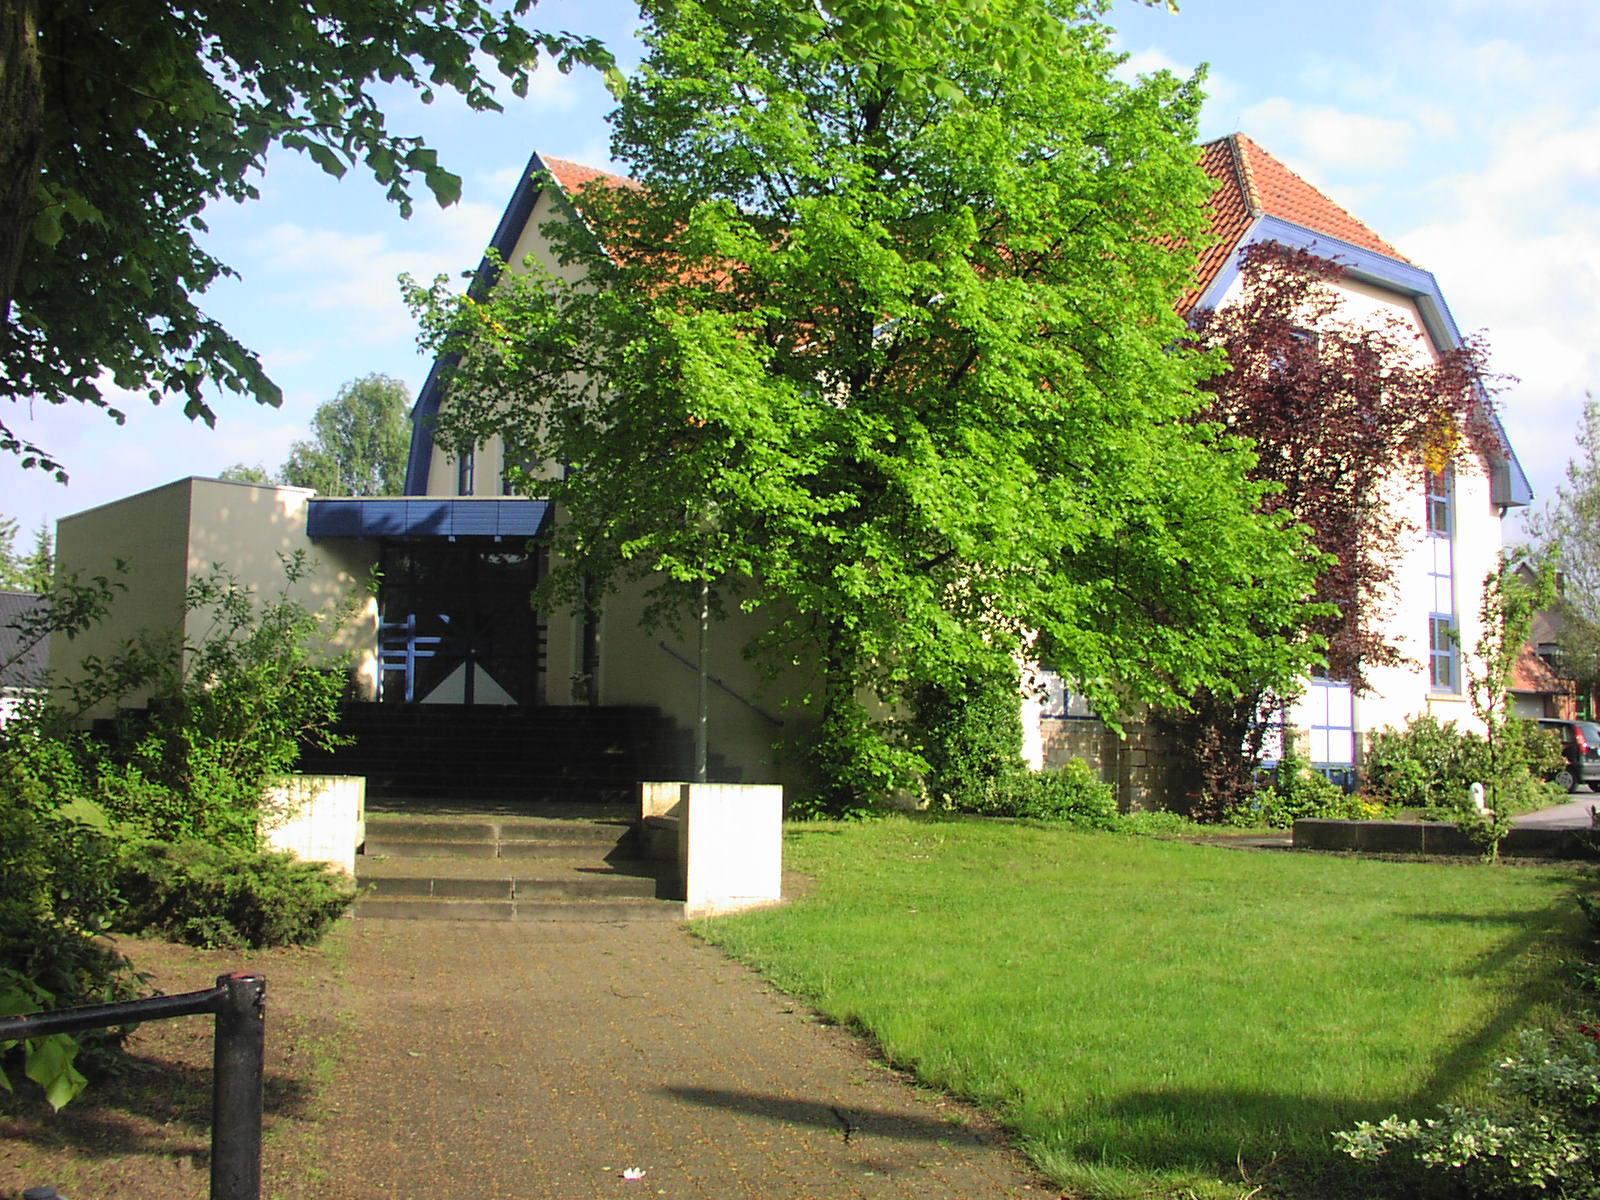 Westbevern